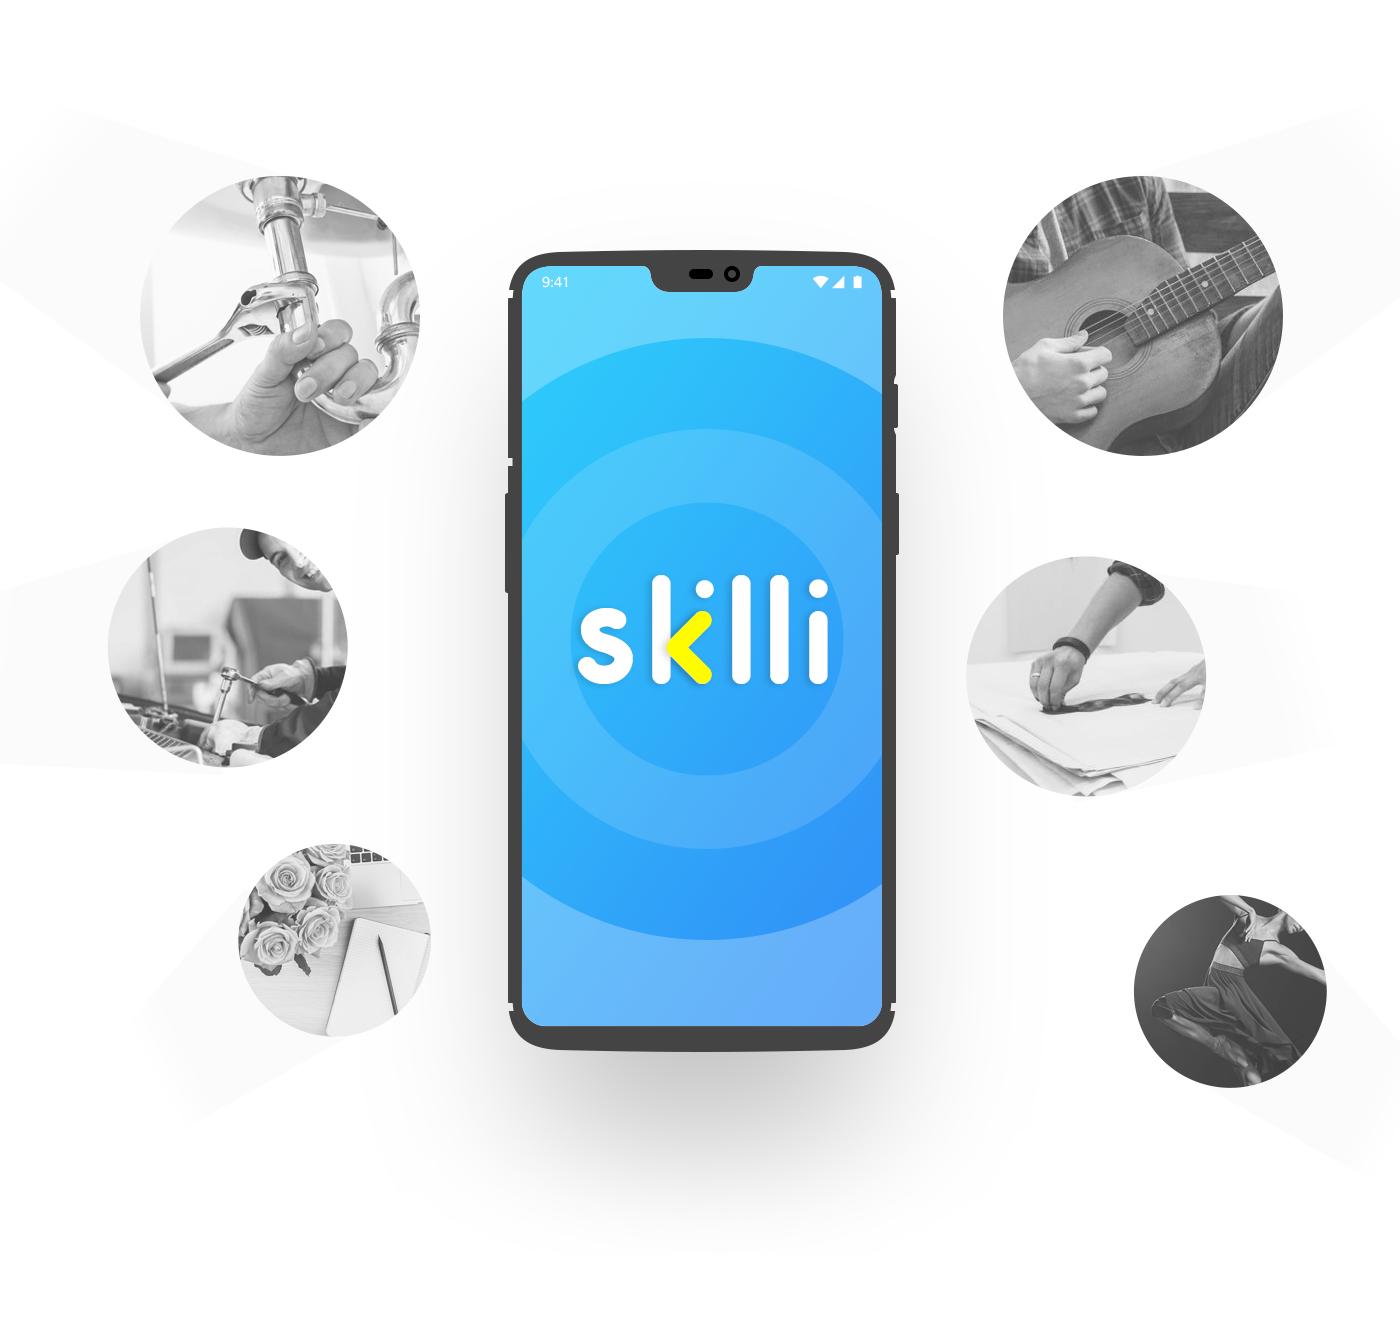 skill freelancer UI Mobile UI UI/UX graphics app ui wireframe creative user interface